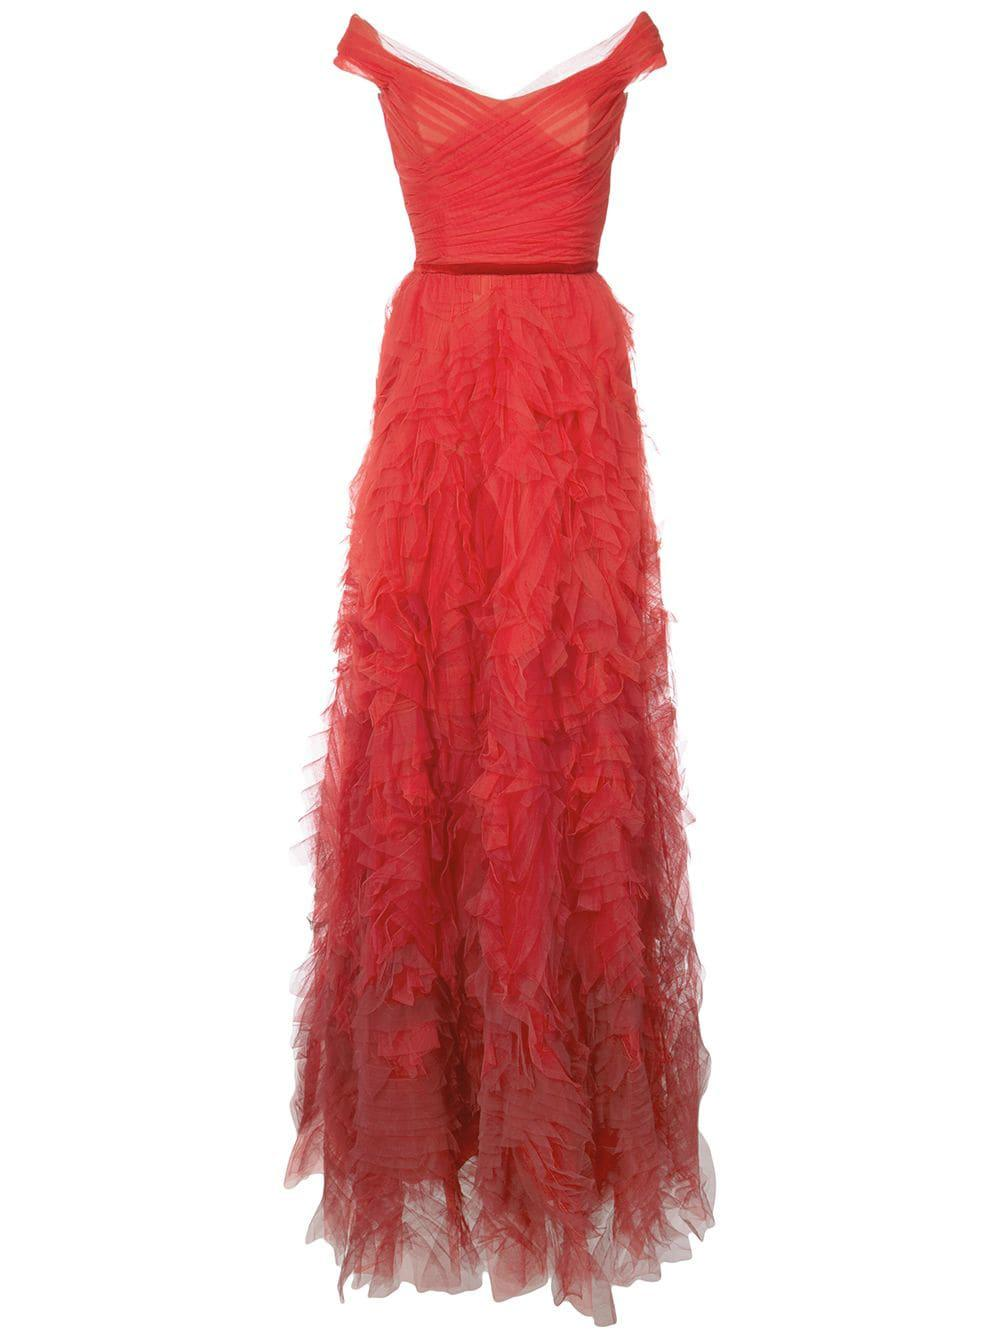 e3af740d25 Marchesa Notte Off Shoulder Ombré Textured Gown In Red | ModeSens